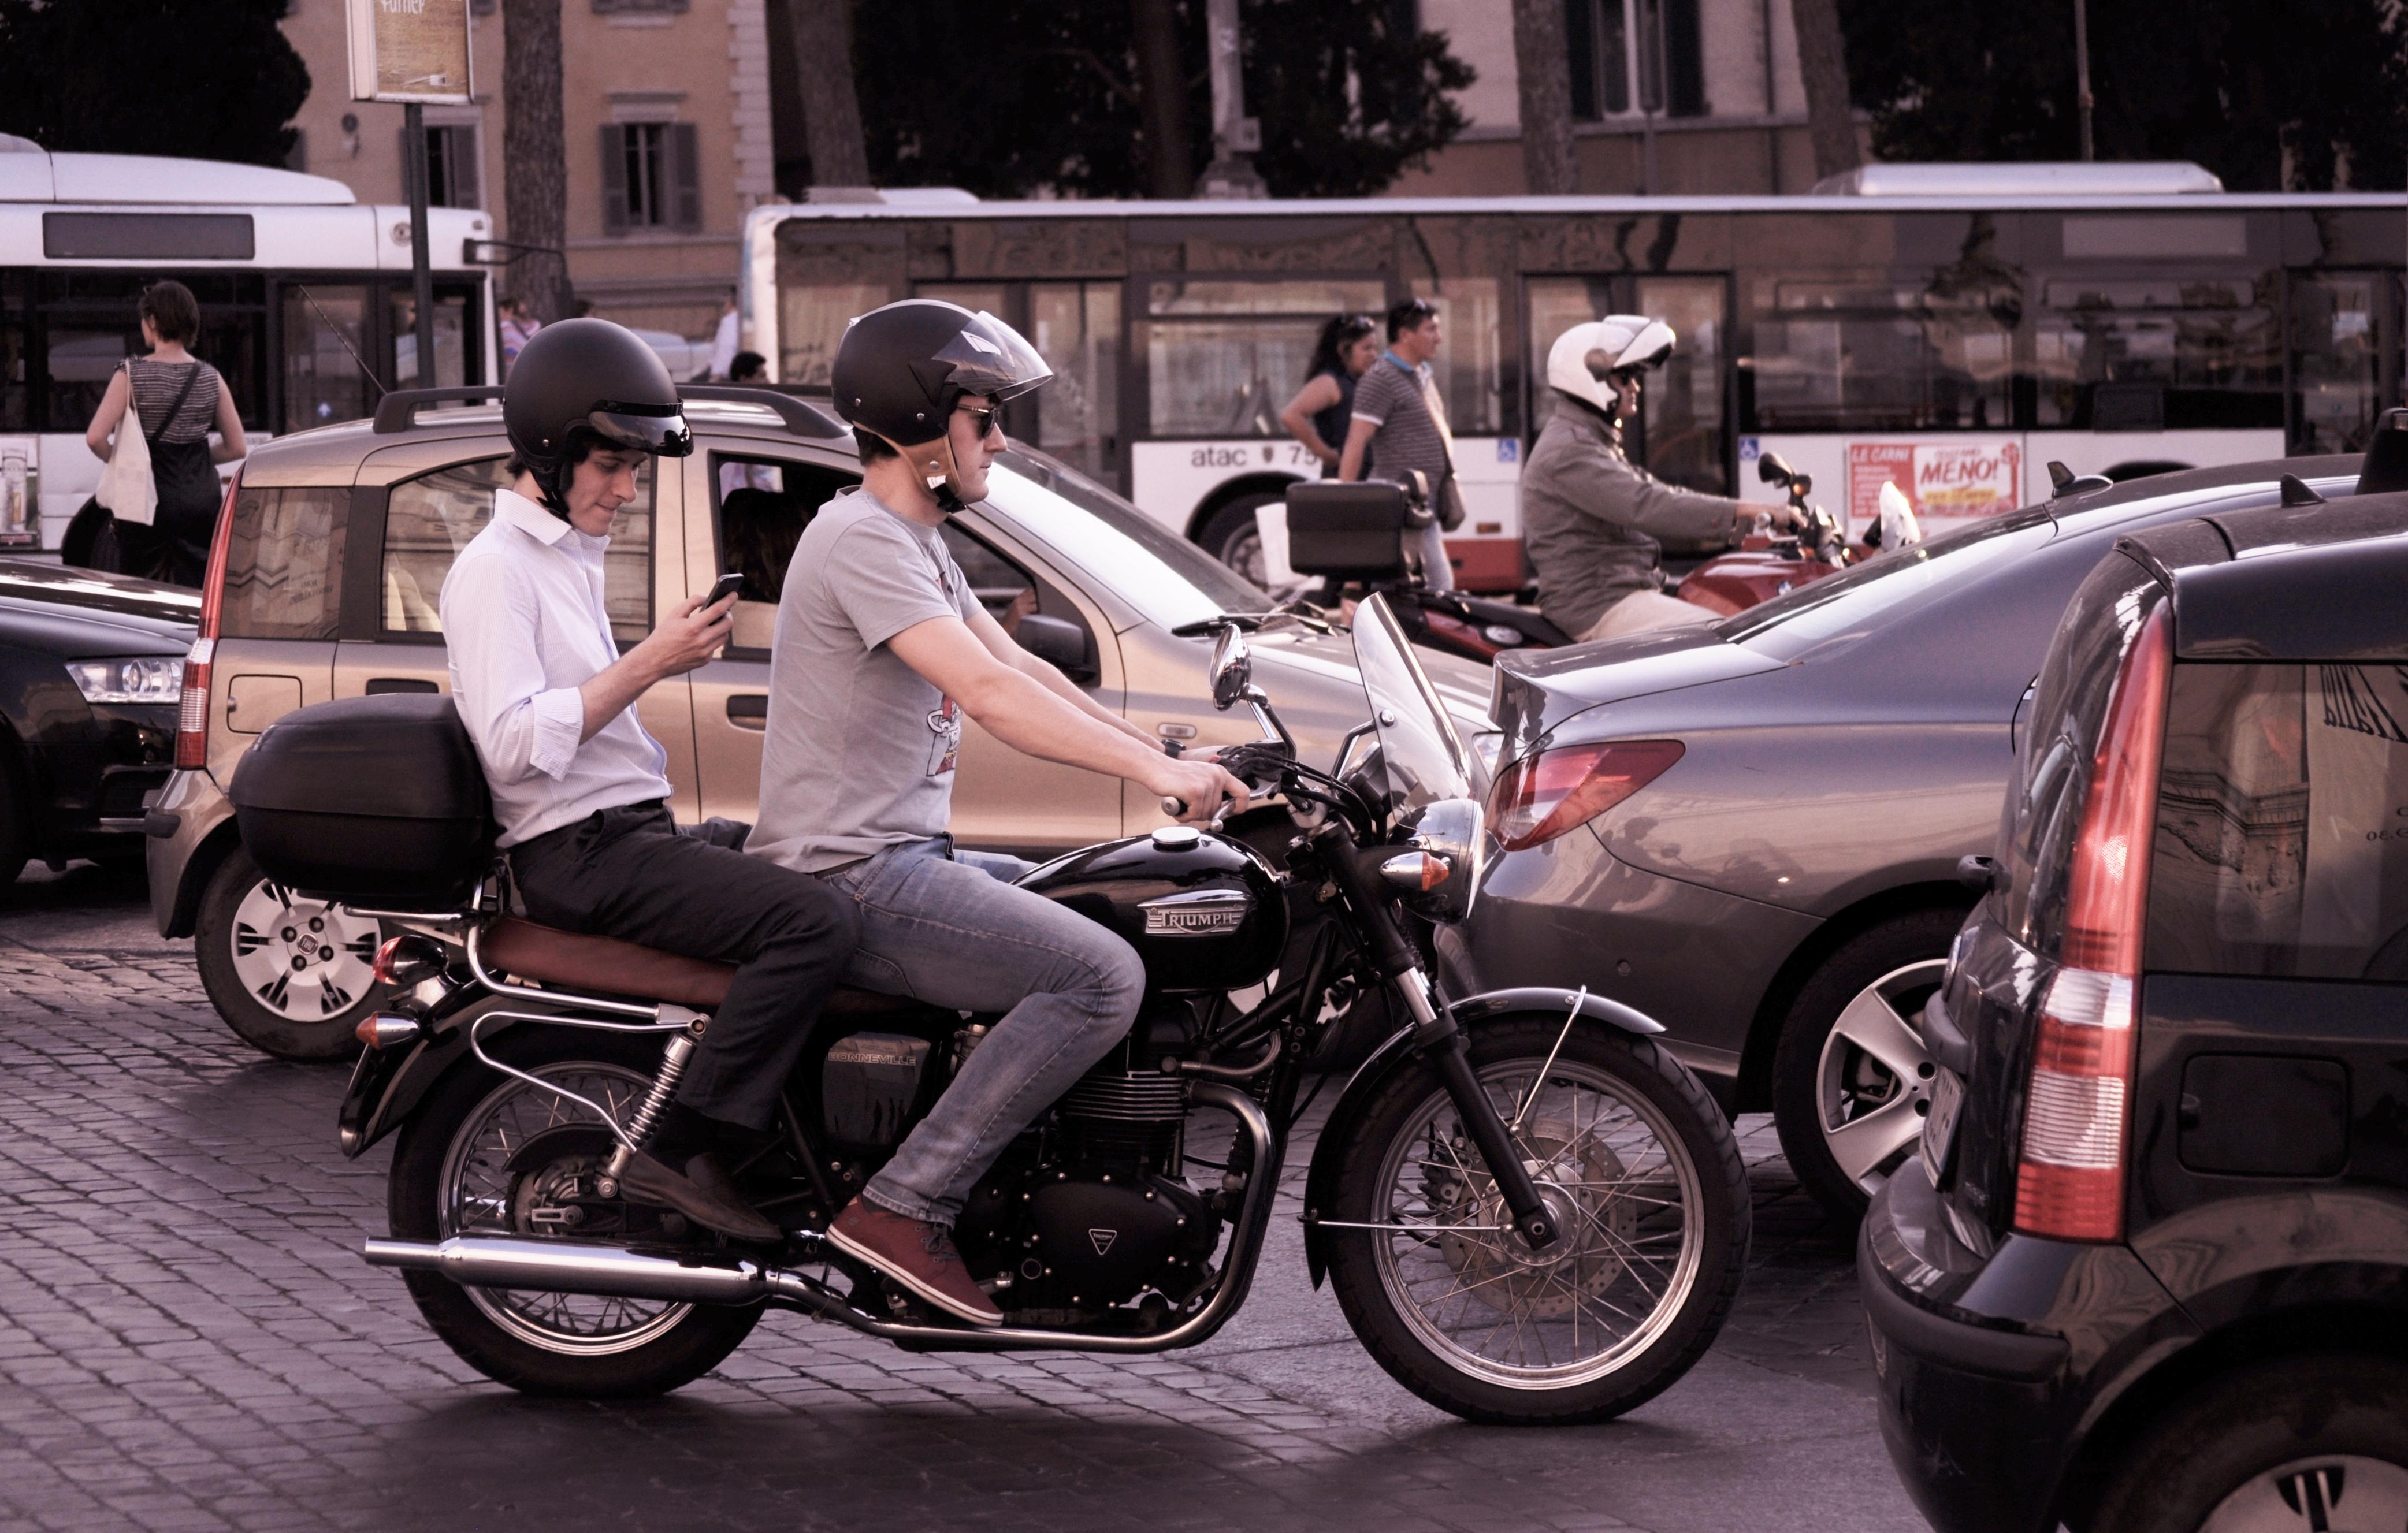 city-traffic-people-smartphone